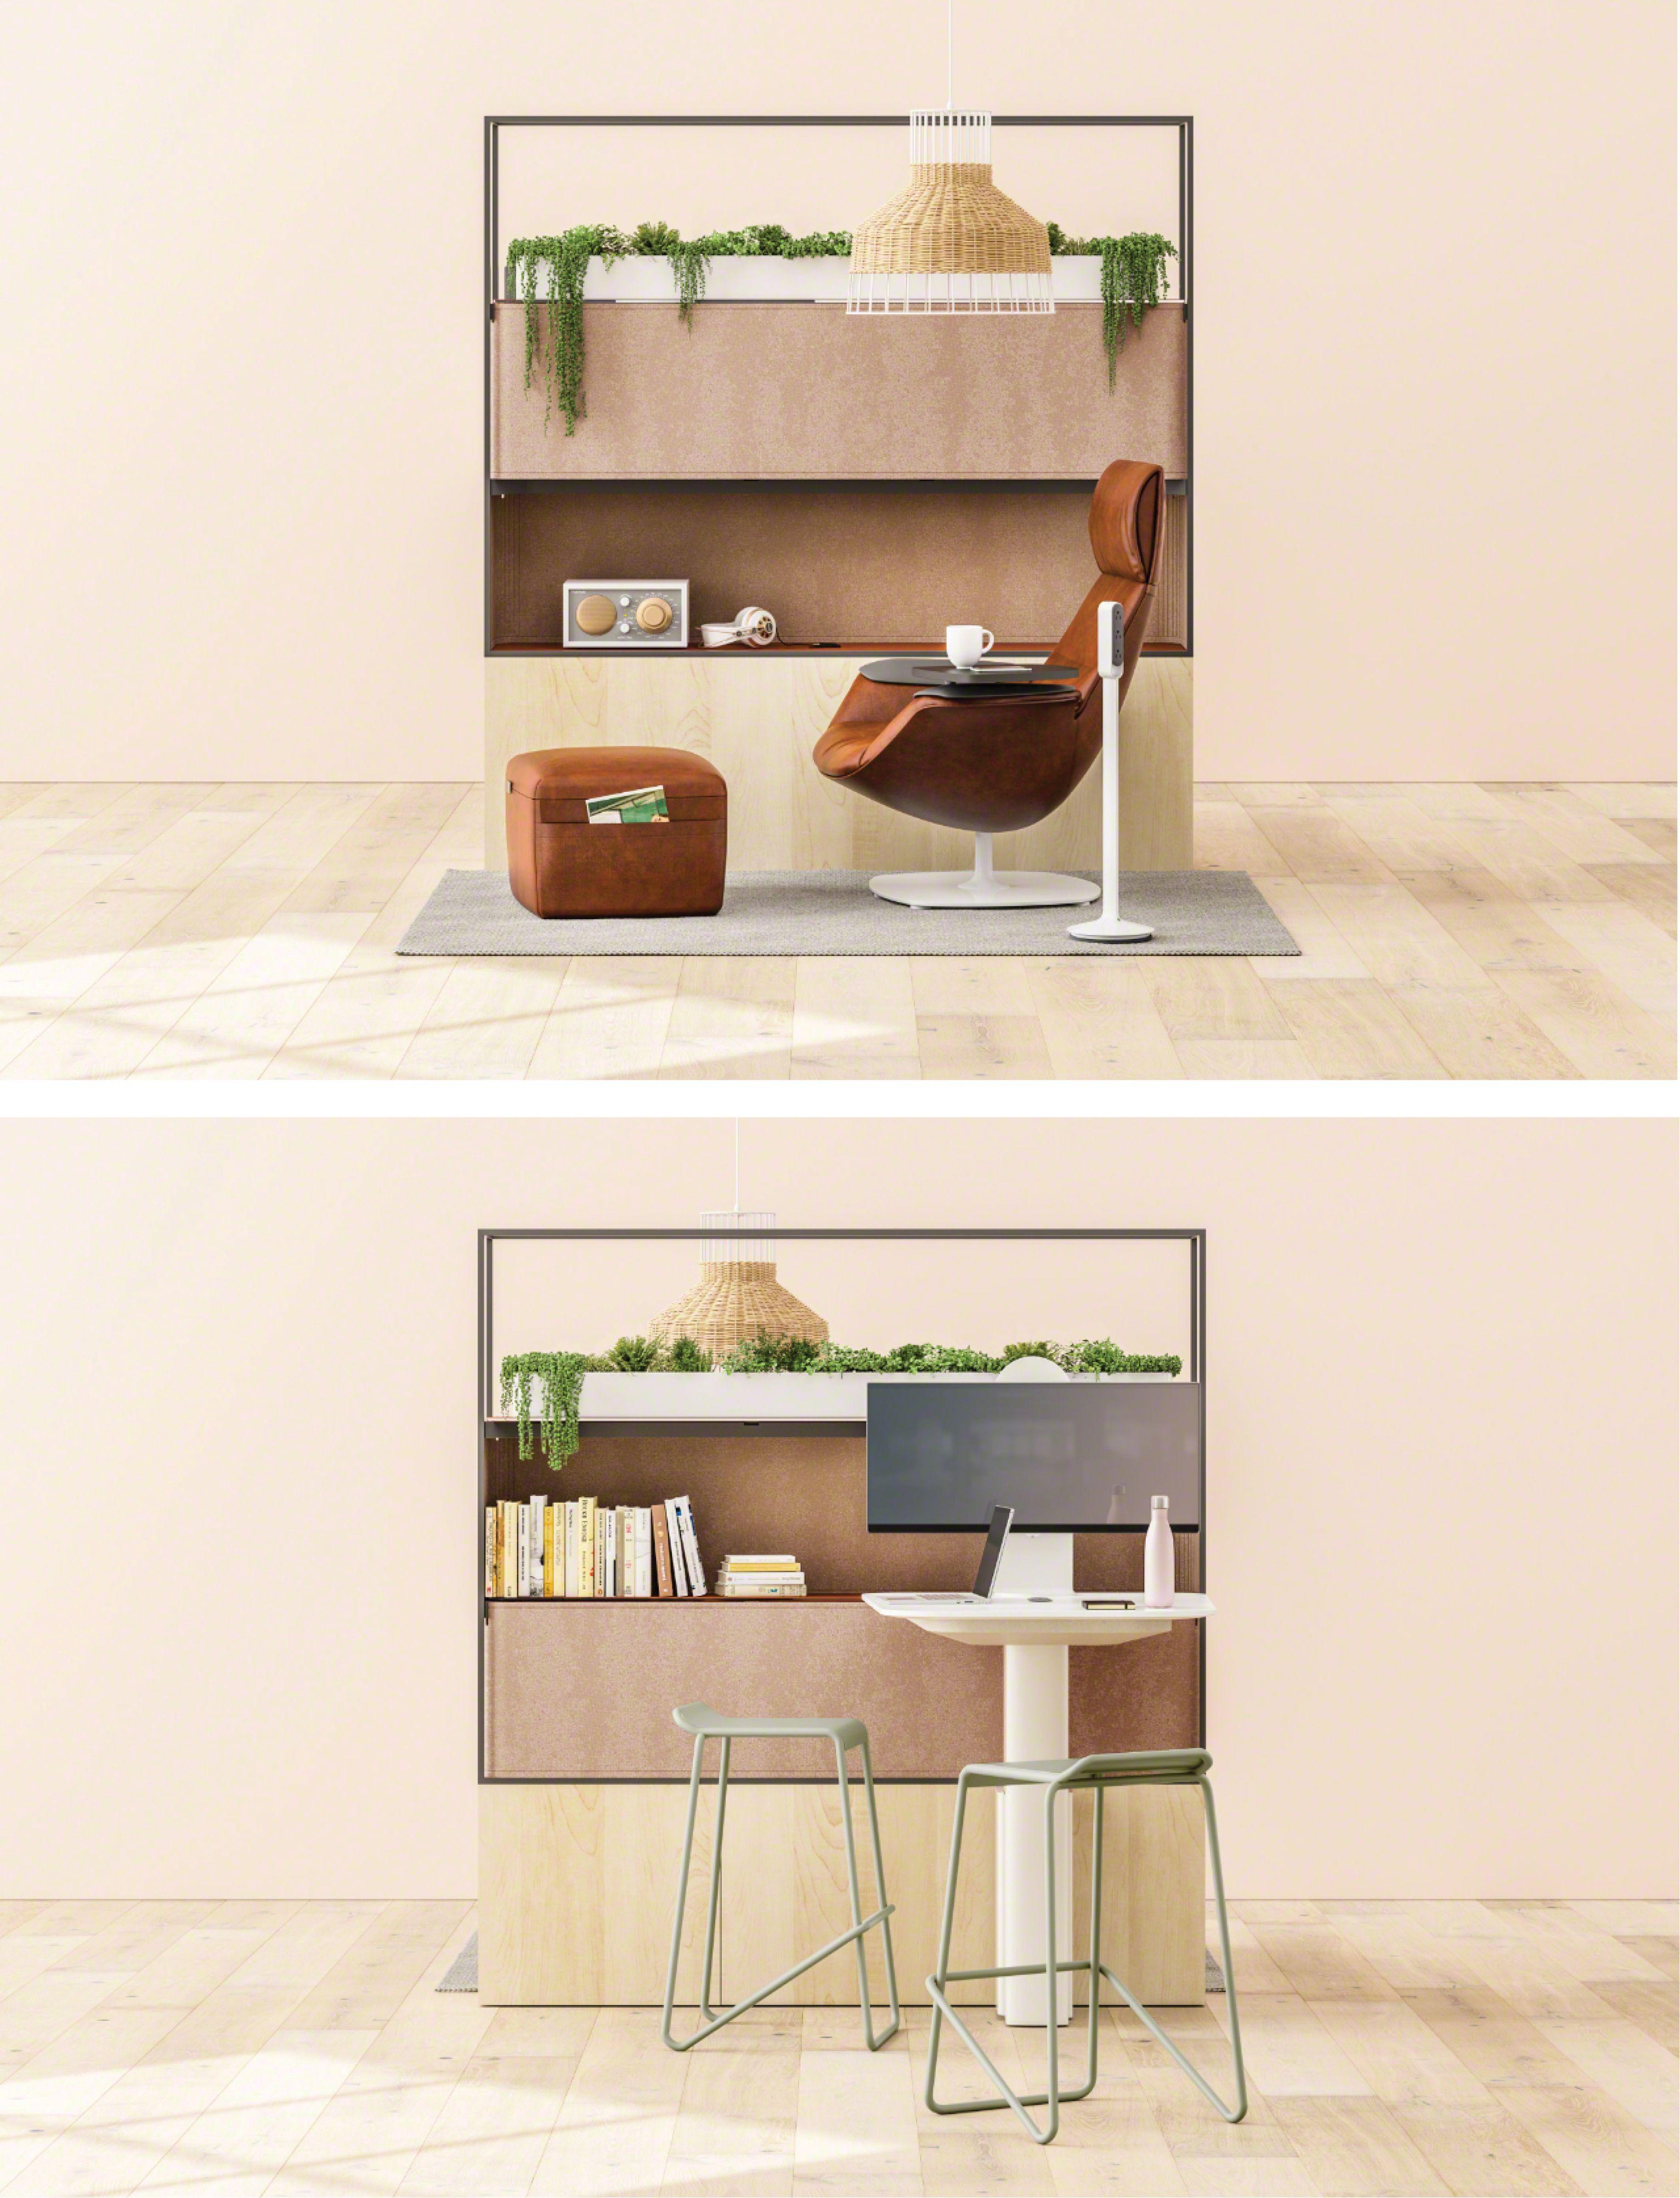 mackinac mackinac modular desk system modular desk system rh pinterest fr